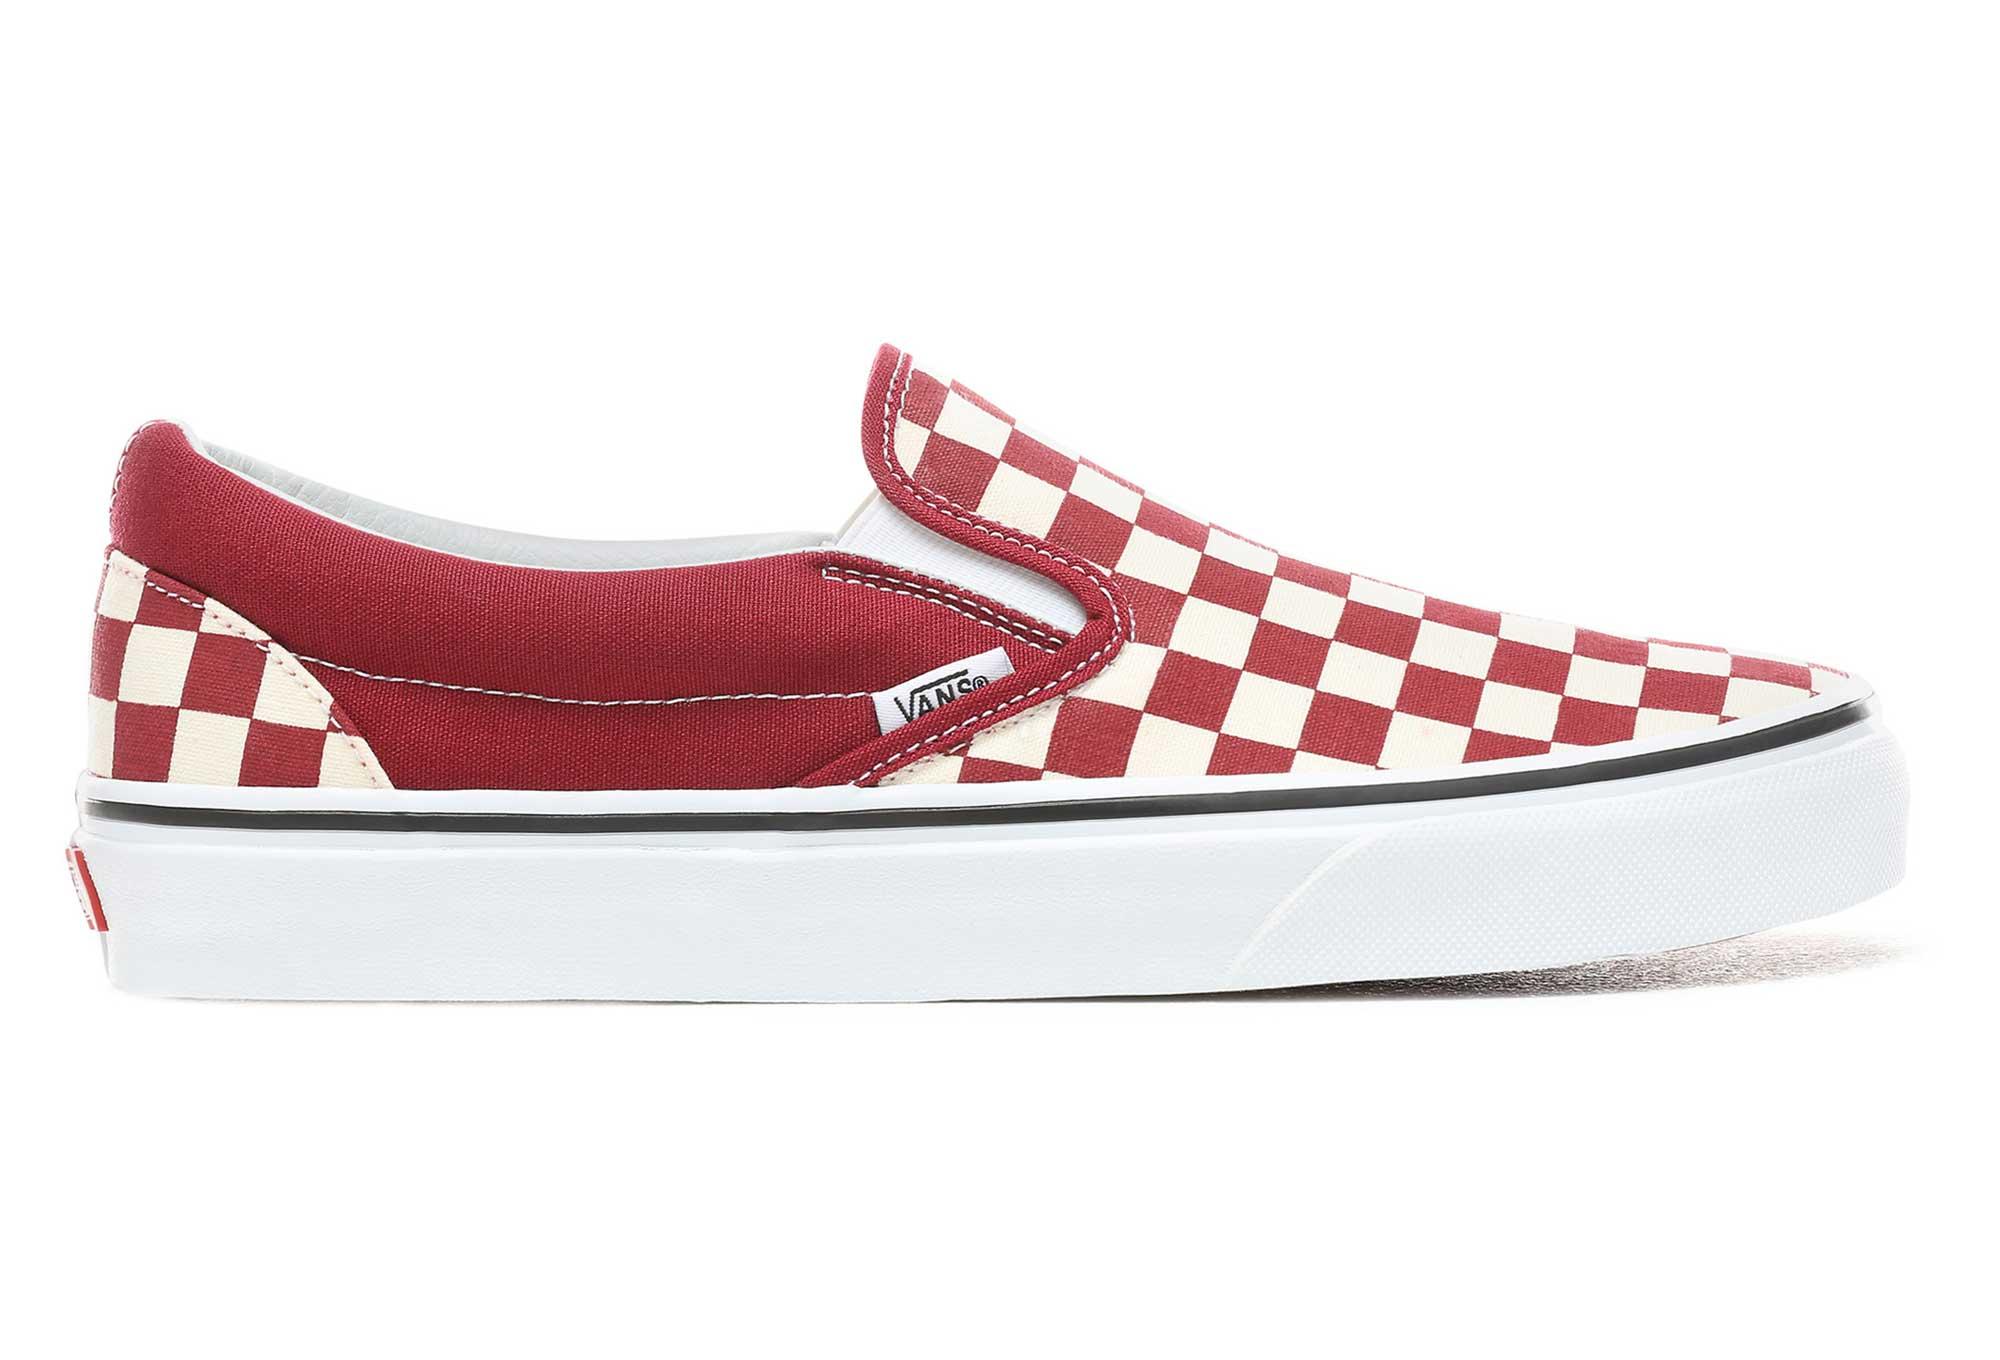 chaussure vans rouge